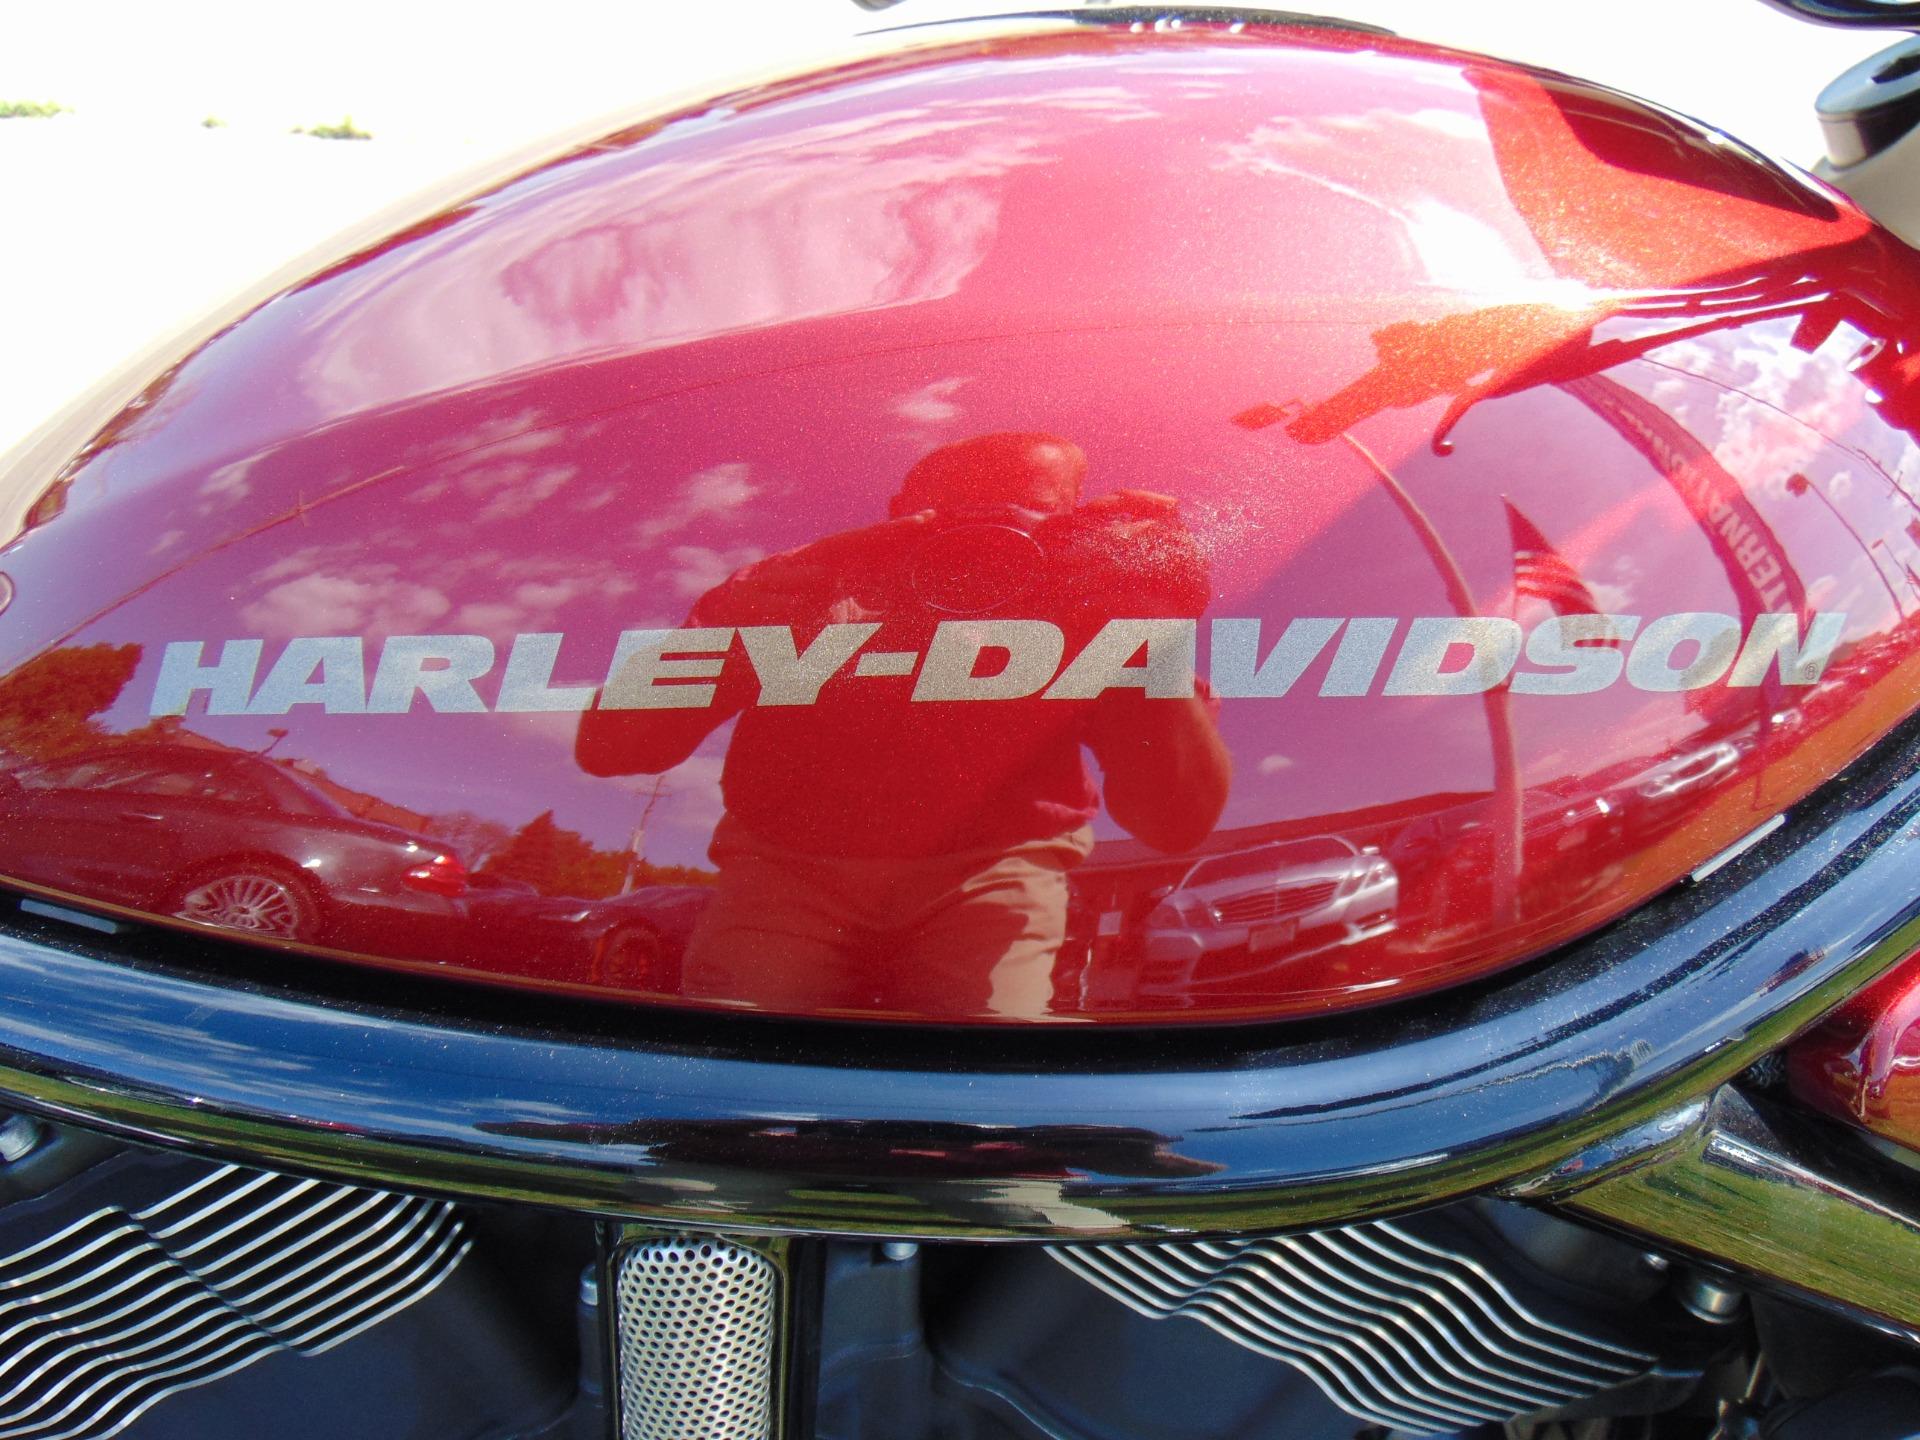 Used-2016-HARLEY-DAVIDSON-Night-Rod-Special